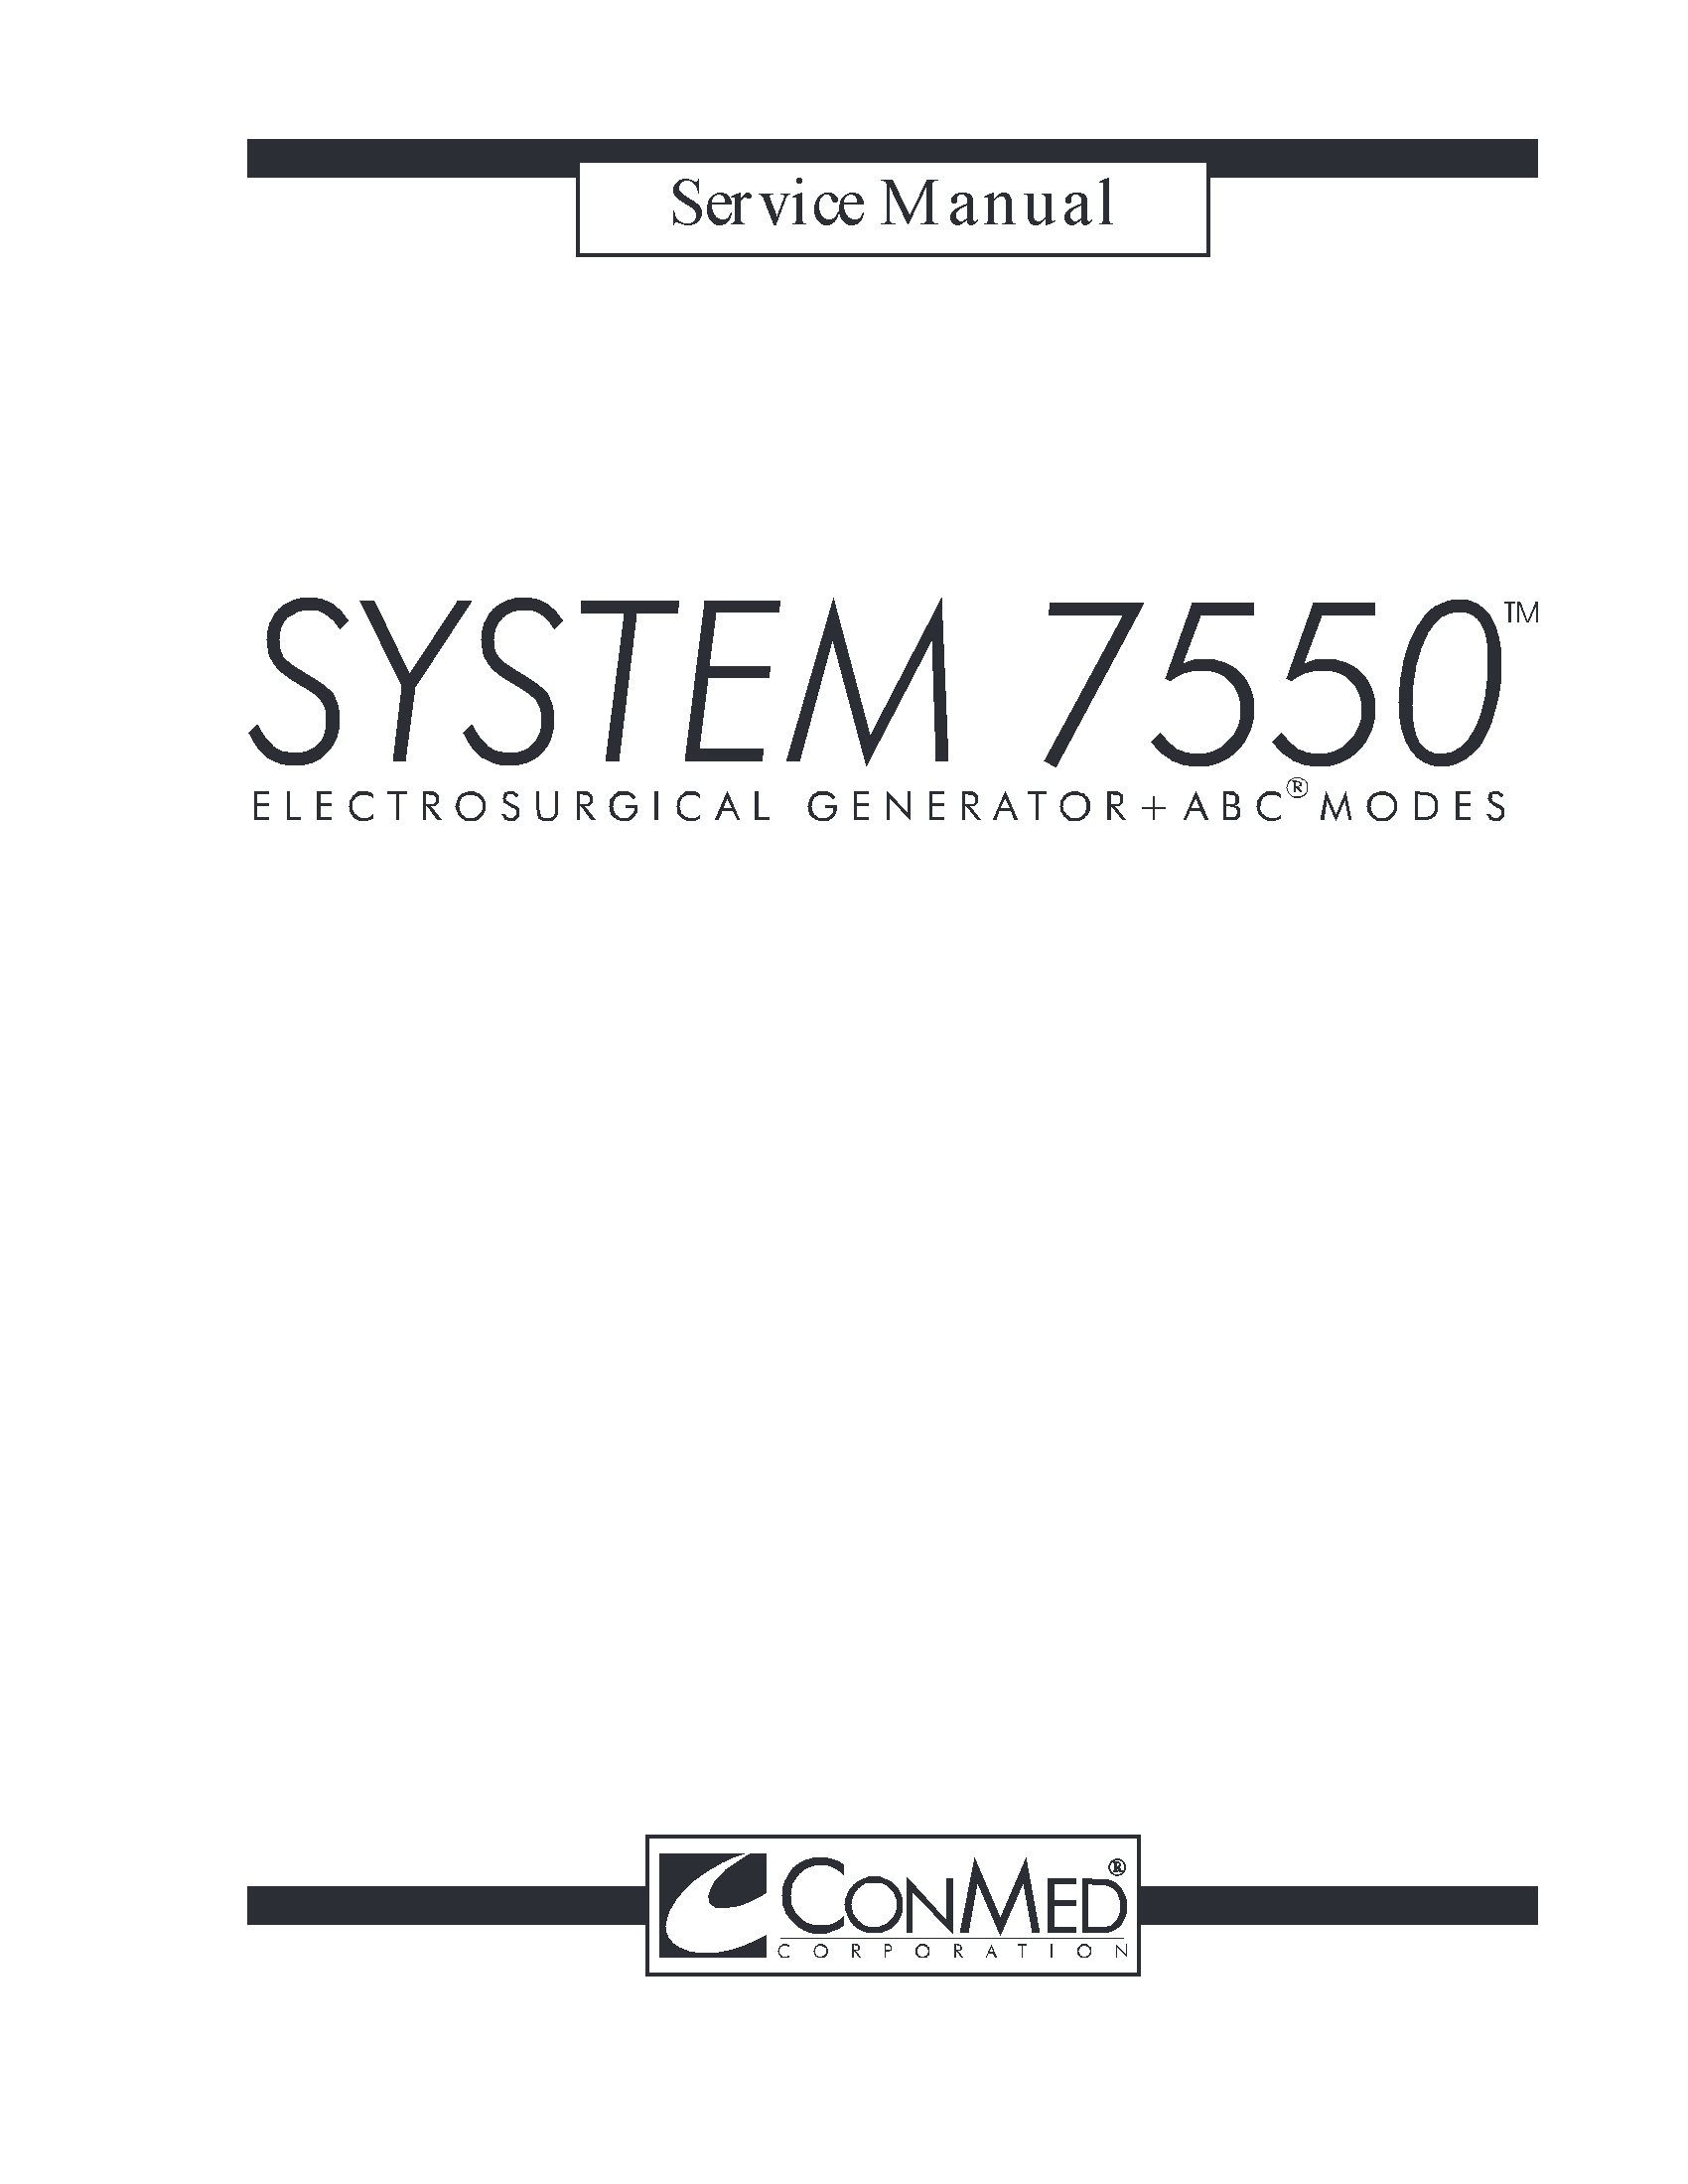 Conmed 7550 Service manual